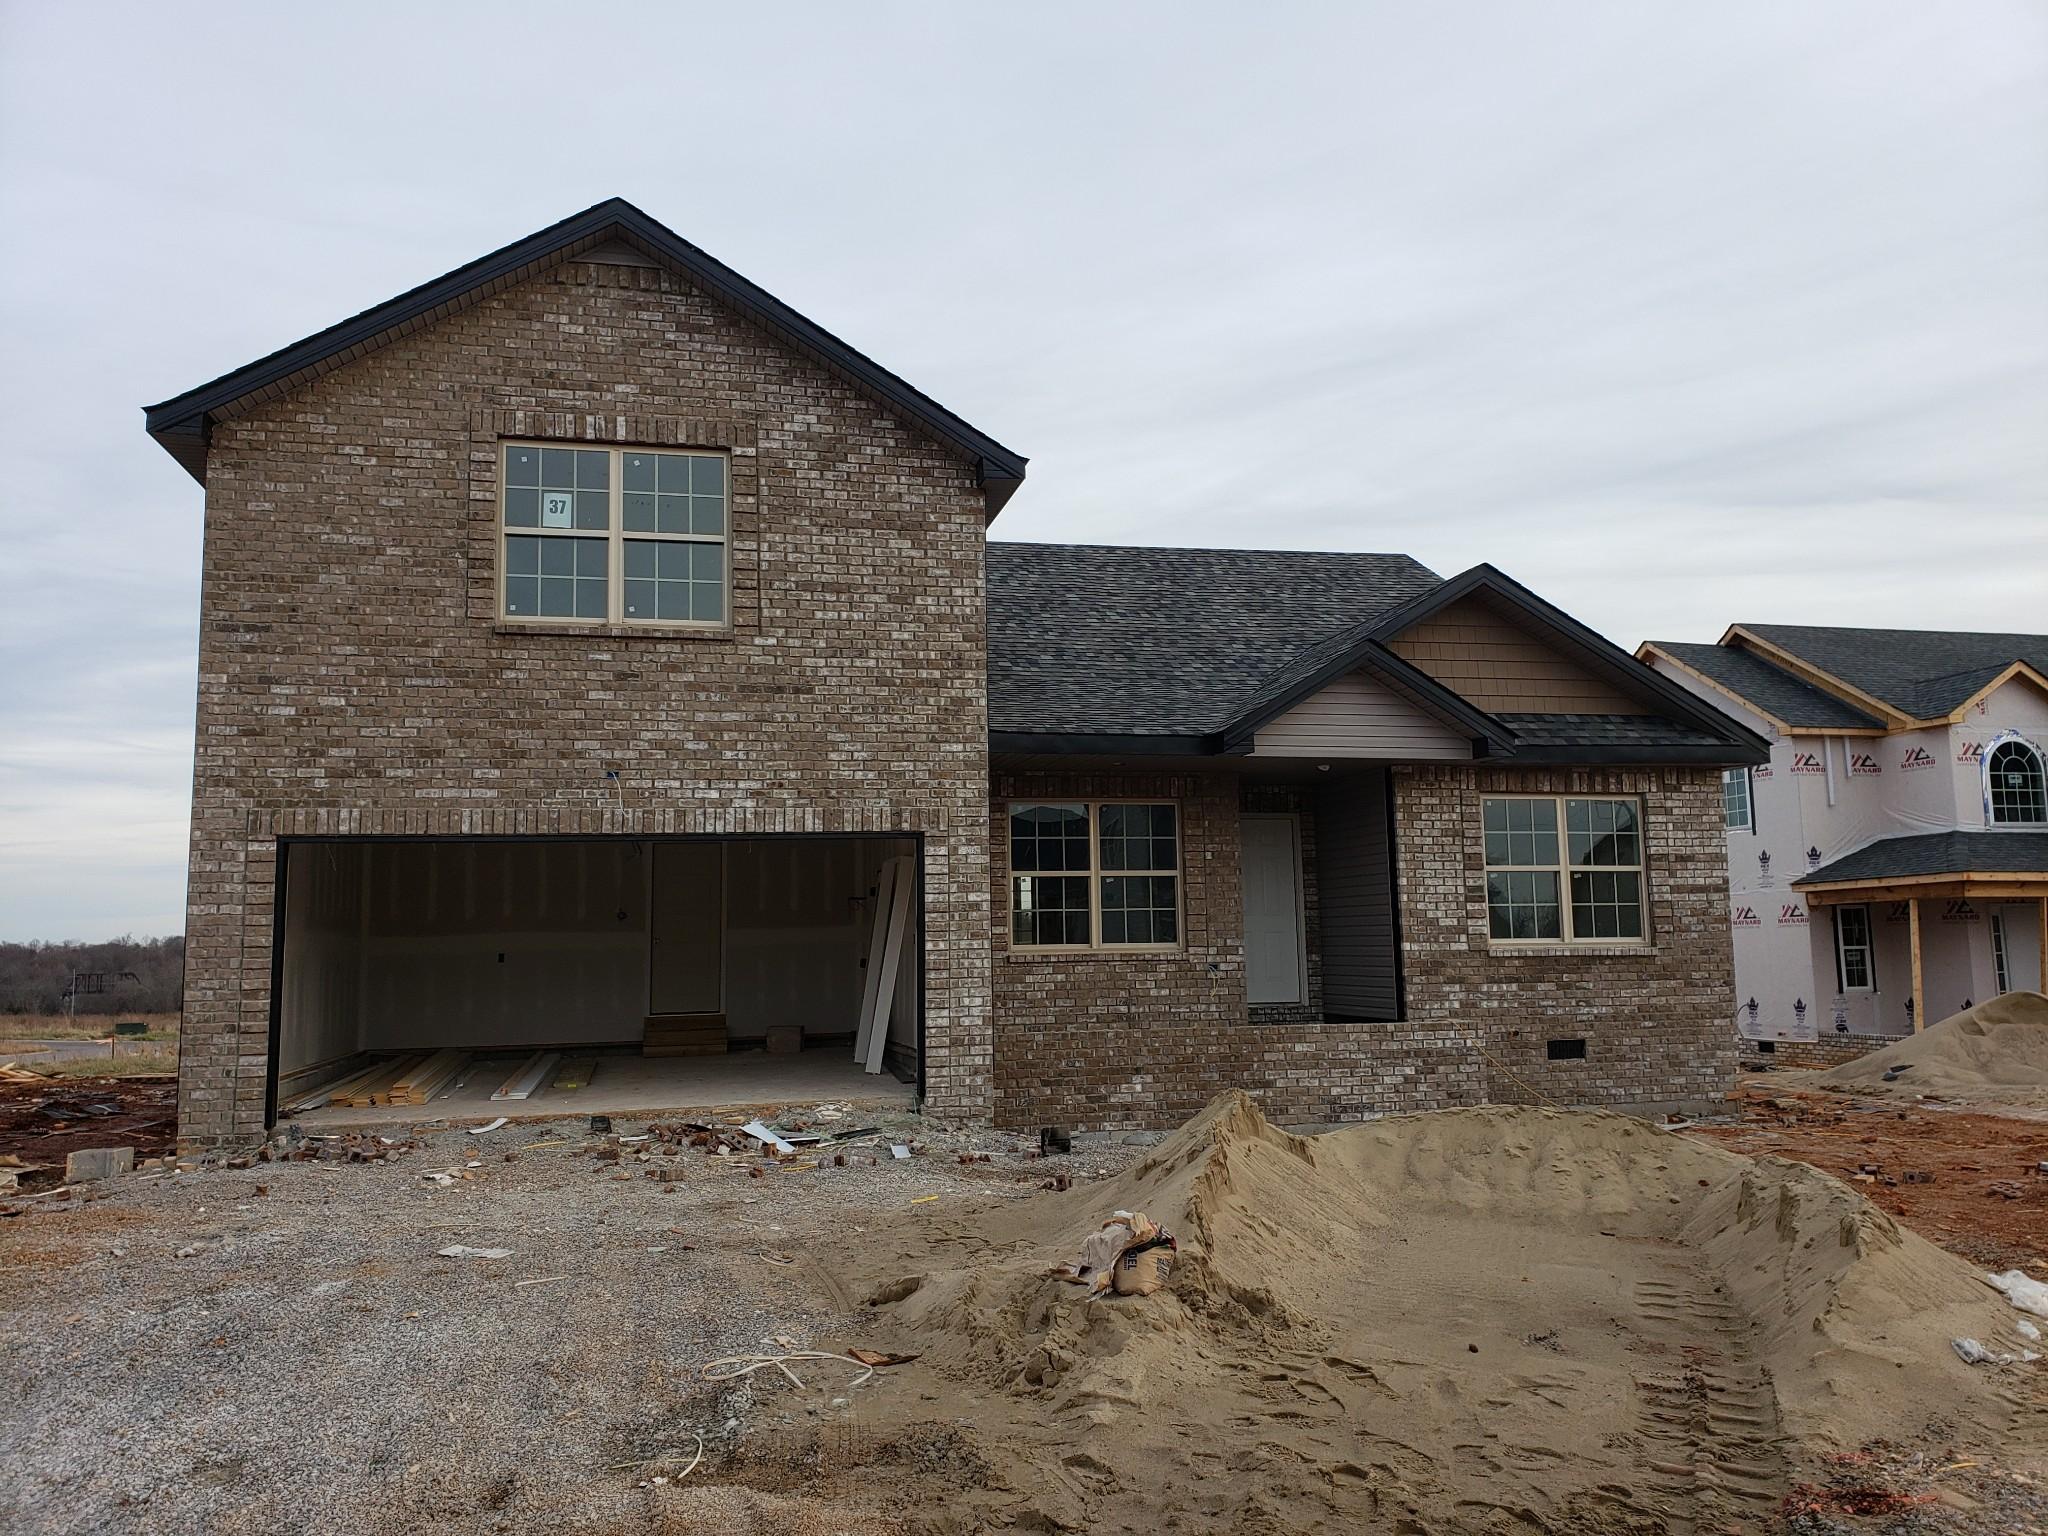 899 Wild Elm Ct (lot 37), Clarksville, TN 37042 - Clarksville, TN real estate listing